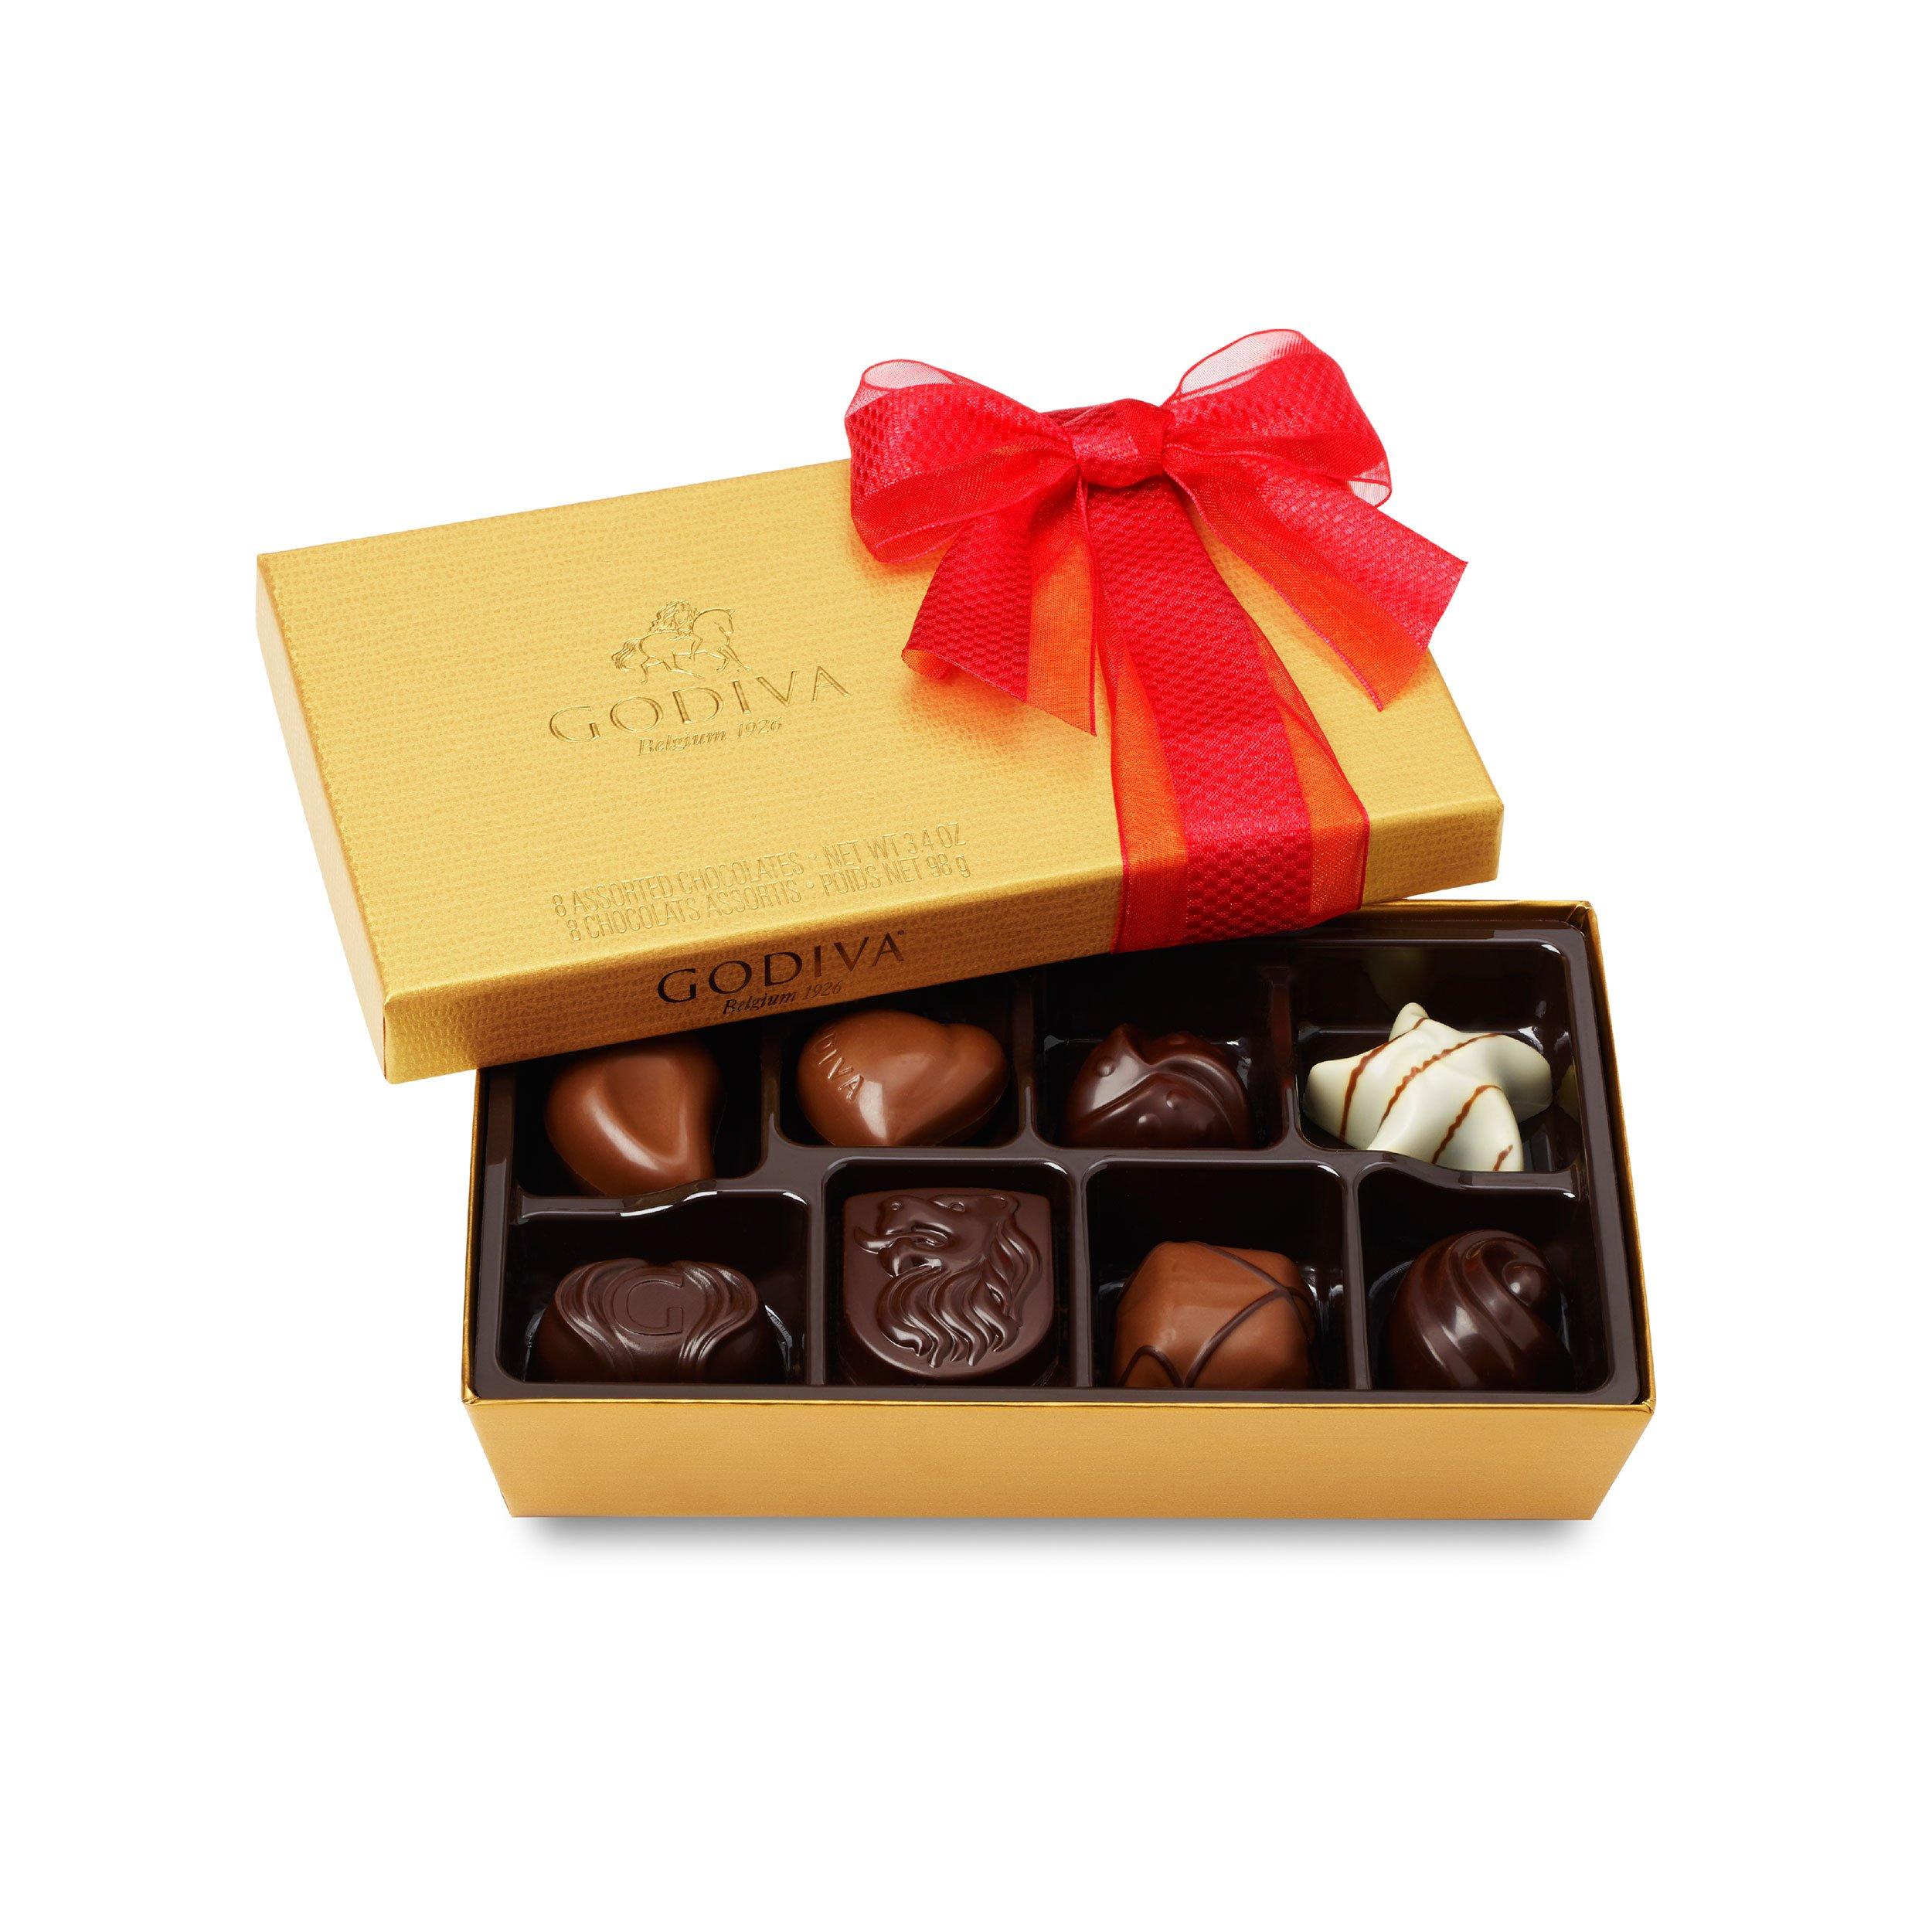 Godiva Chocolatier Mother's Day Gold Ballotin Assorted Gourmet Chocolates 8 Piece Gift Box by GODIVA Chocolatier